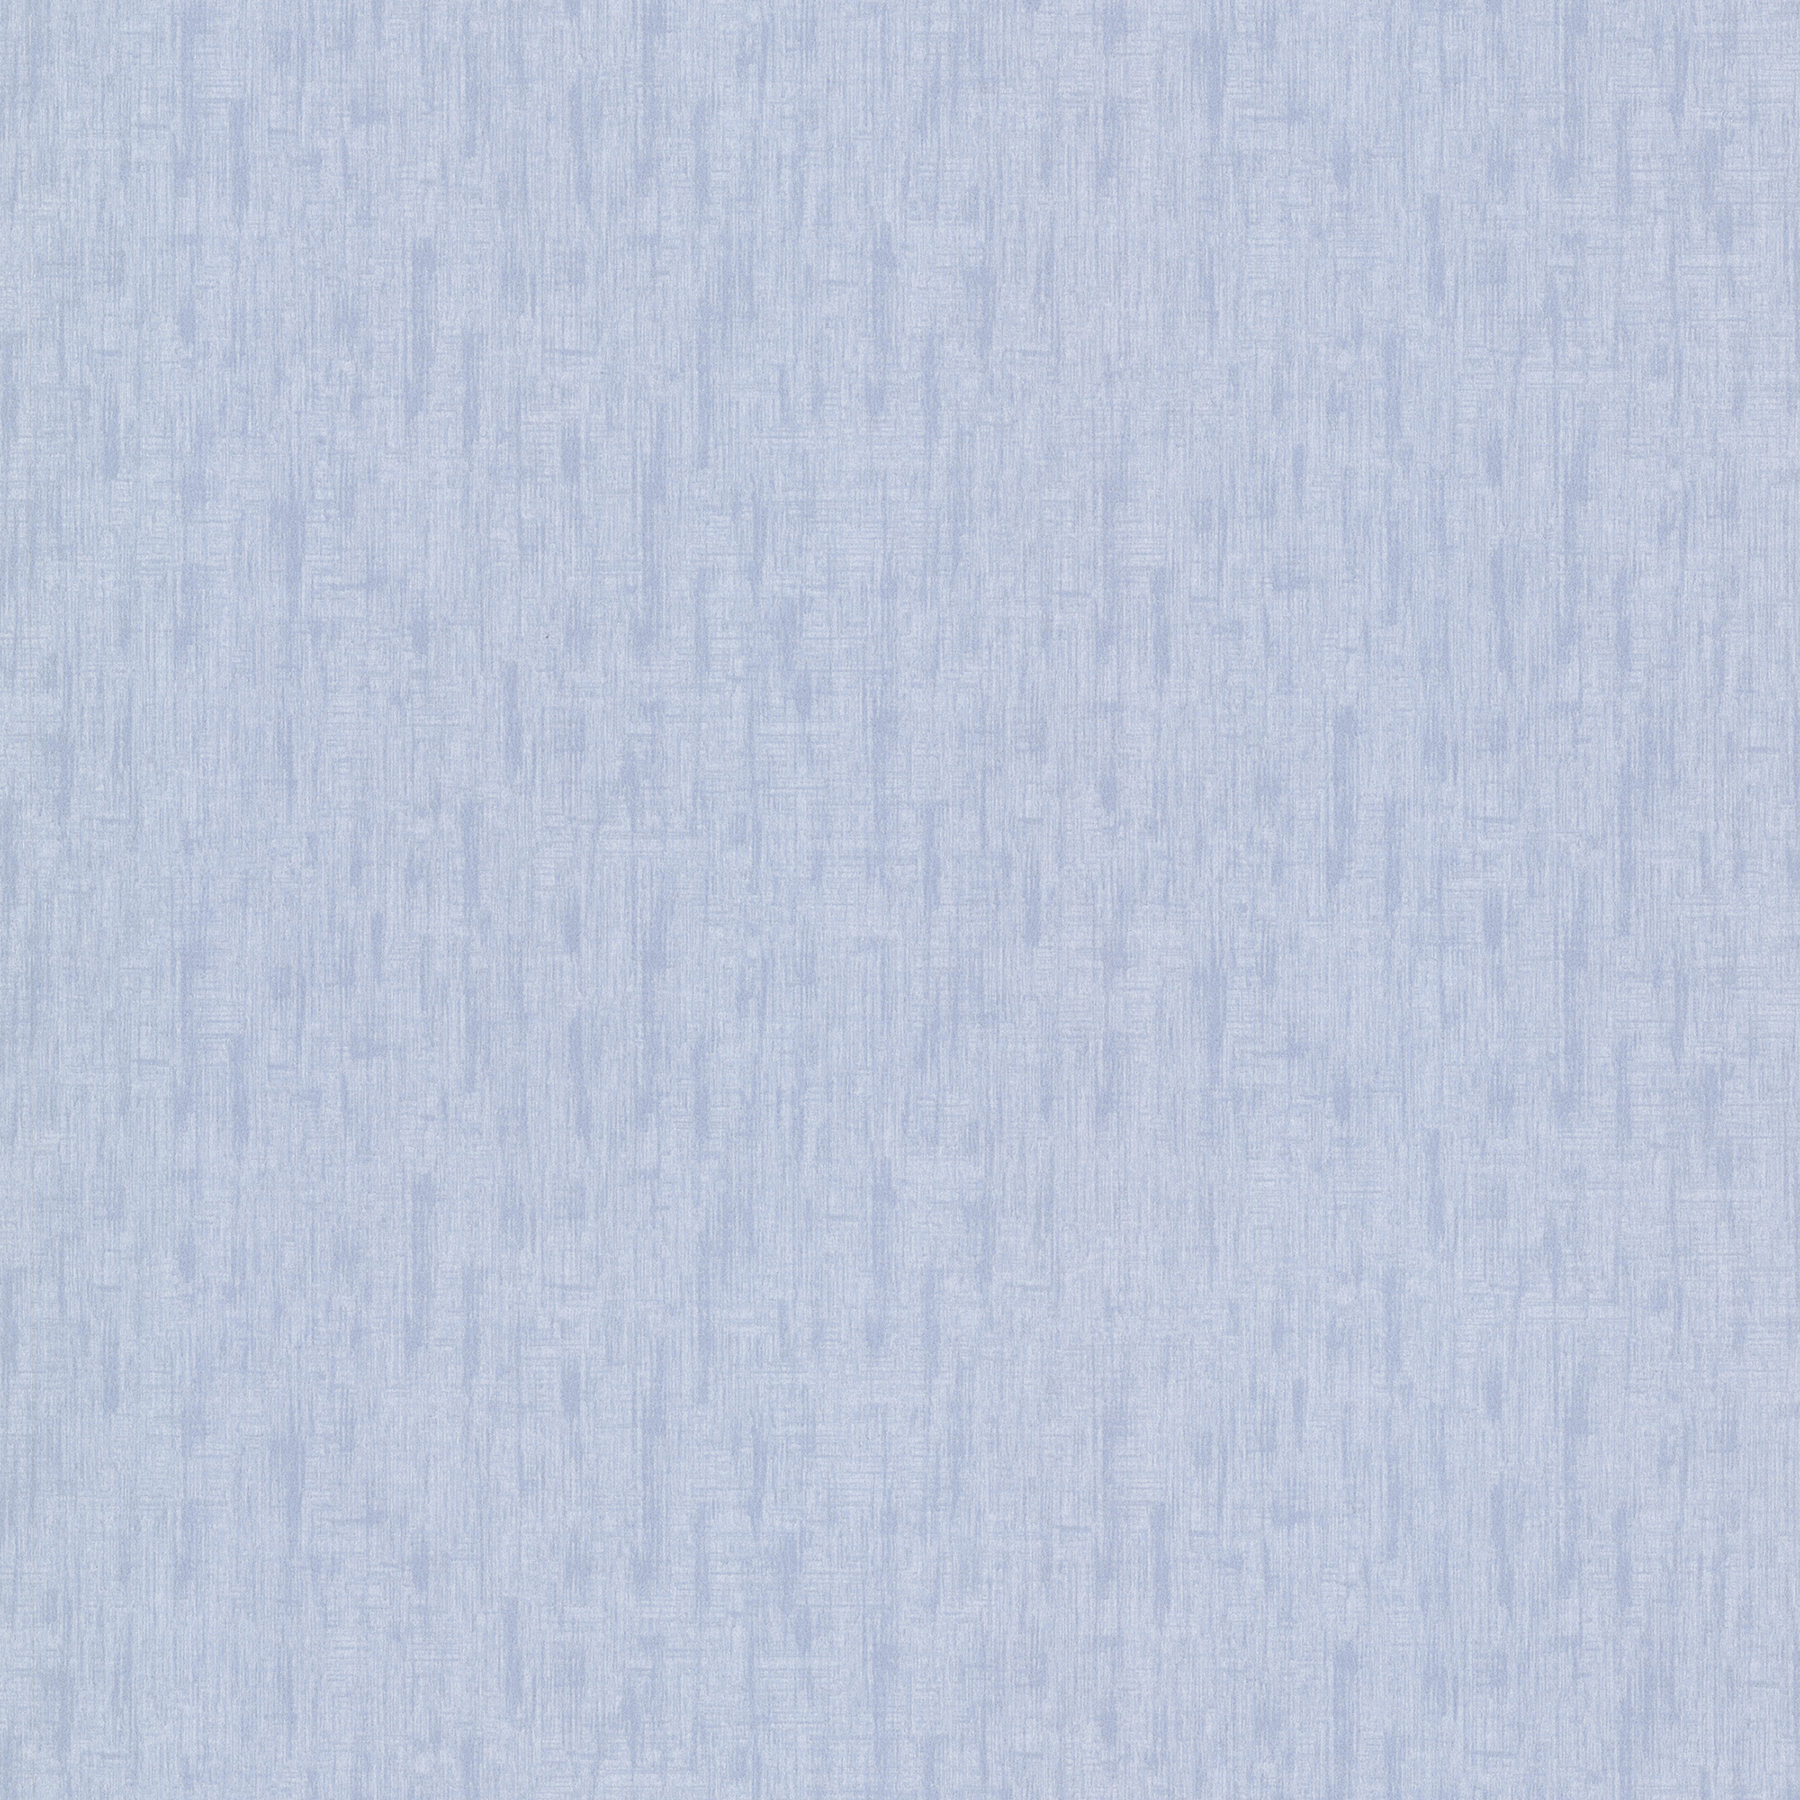 Picture of Aurelia Blue Texture Wallpaper